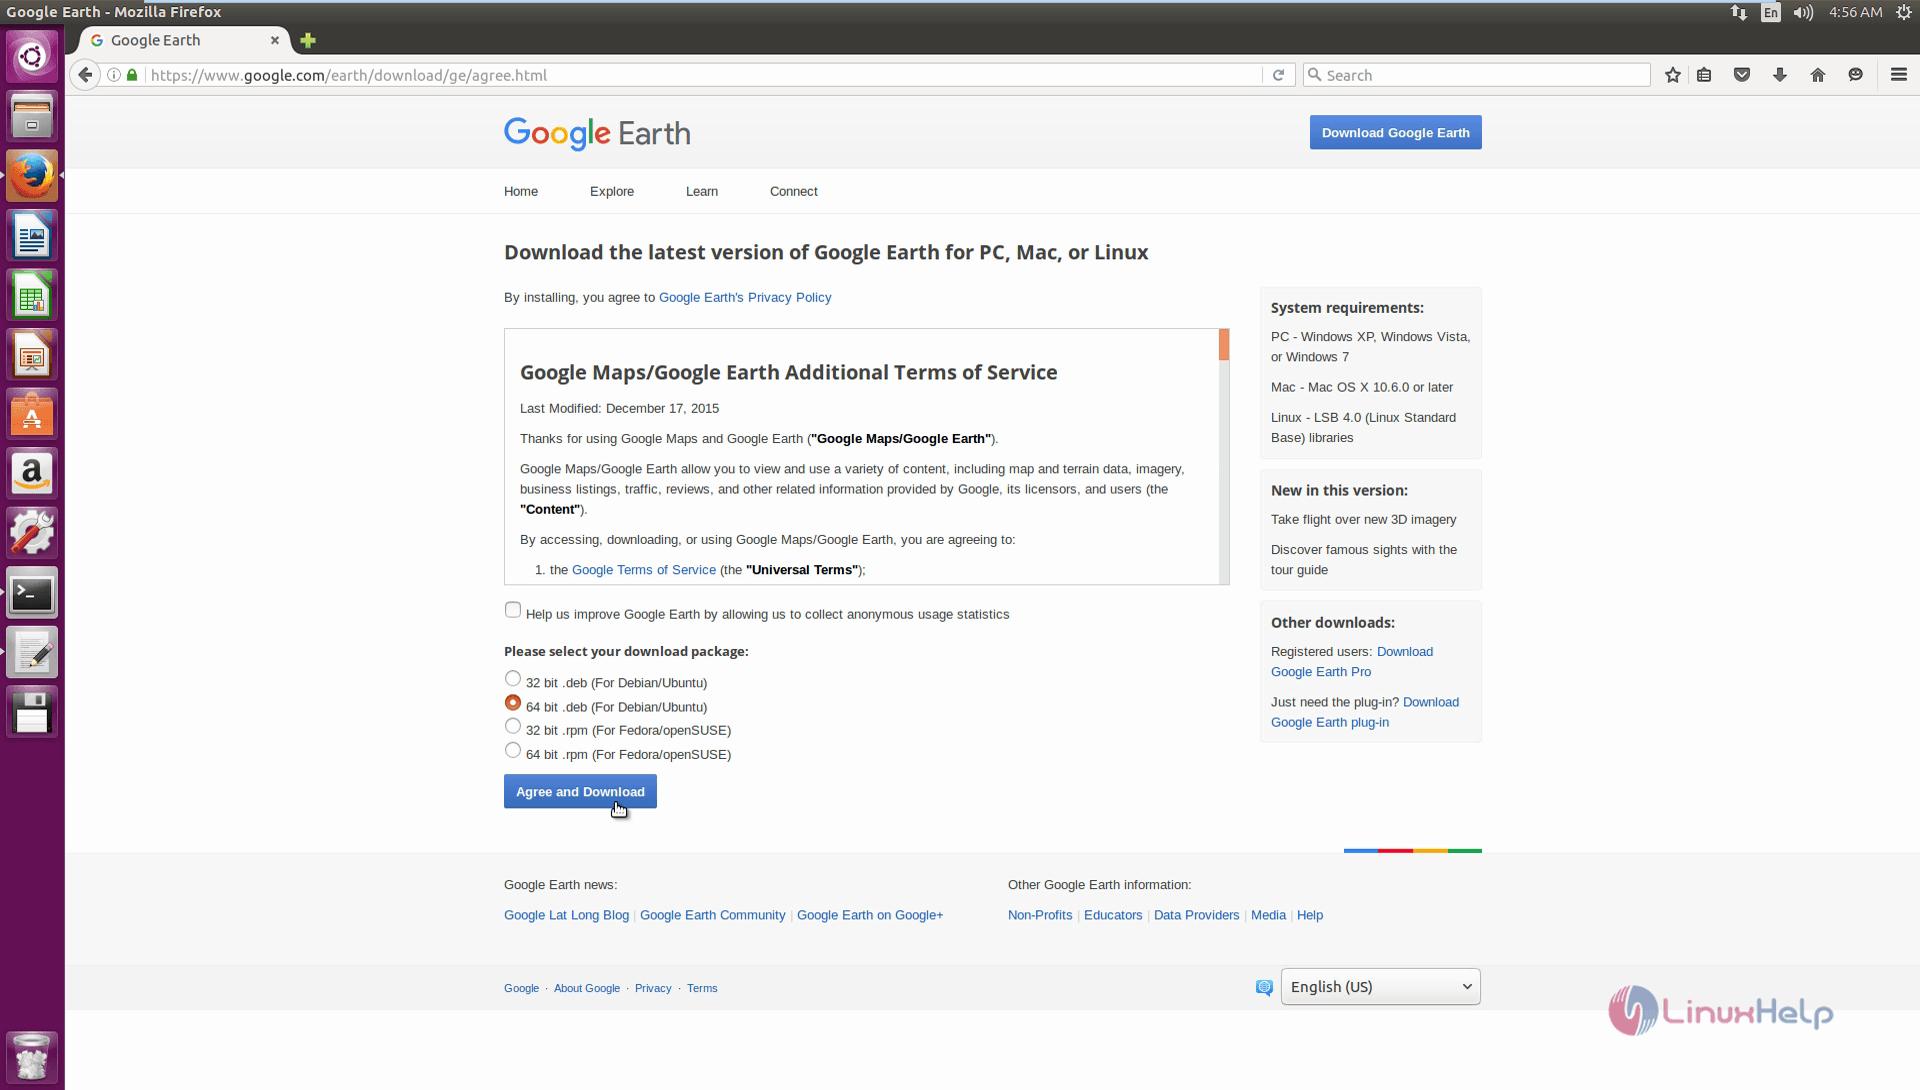 Installation_Google_Earth_Ubuntu16.04_